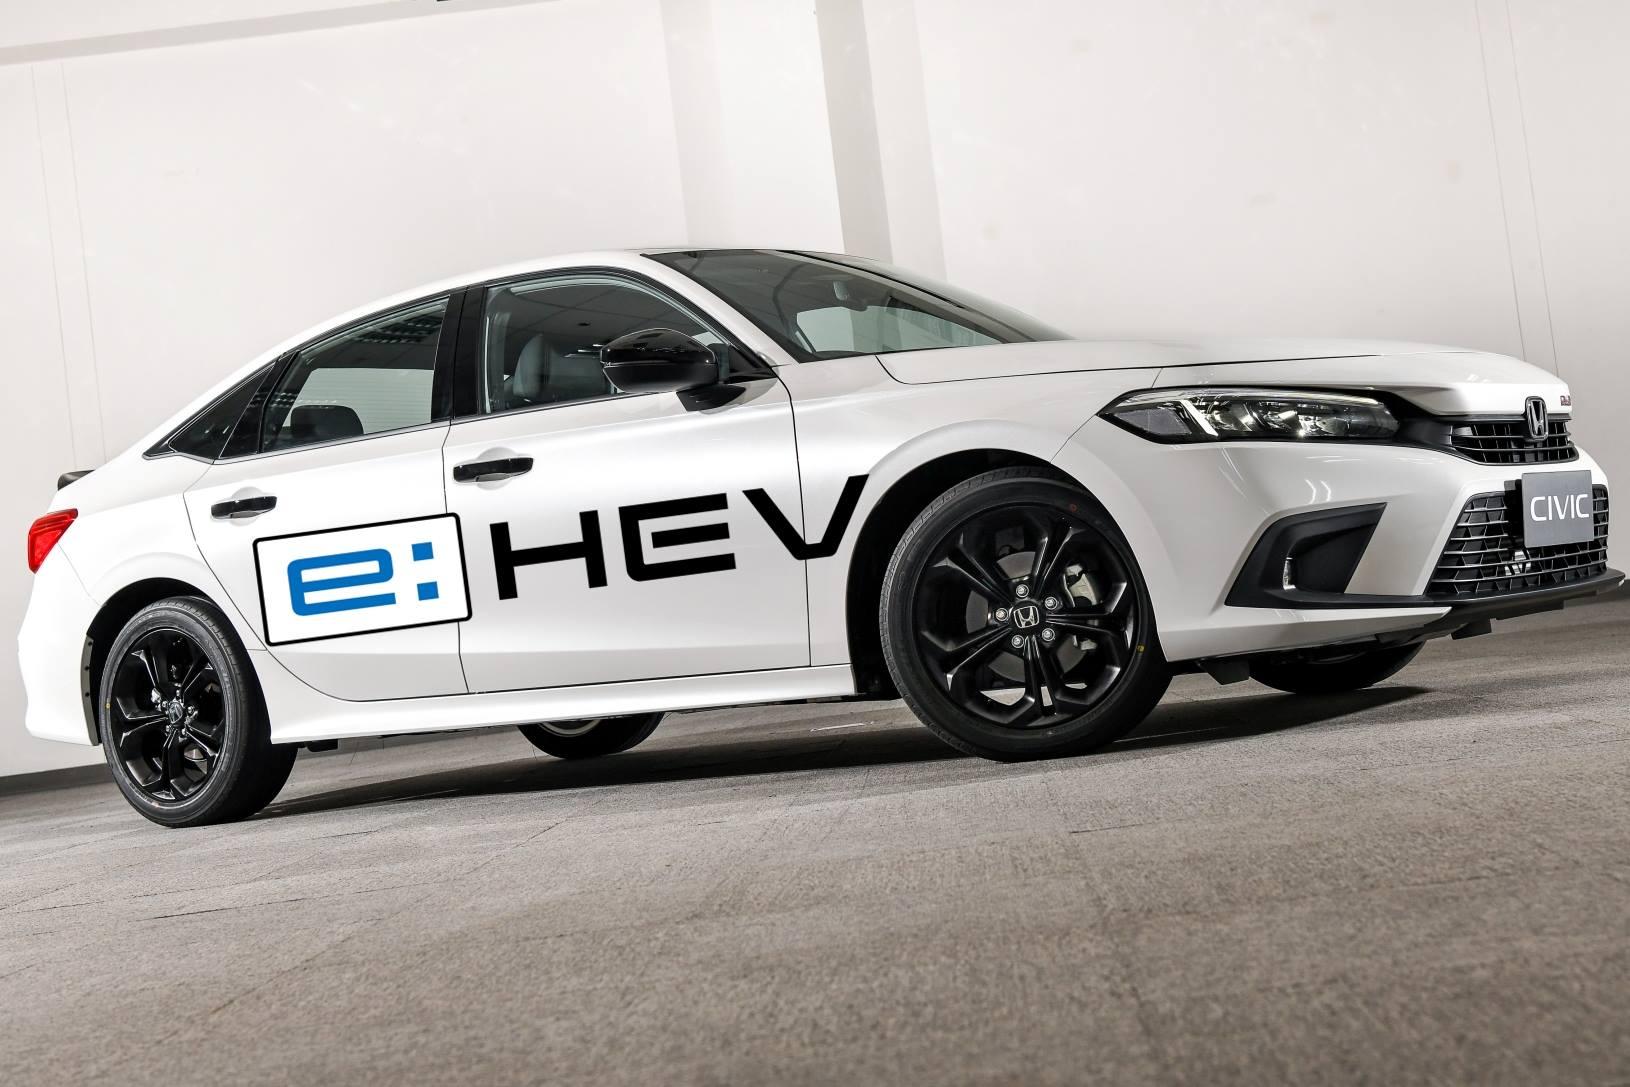 Honda Civic eHEV Hybrid 2022 AutoinfoOnline (11)